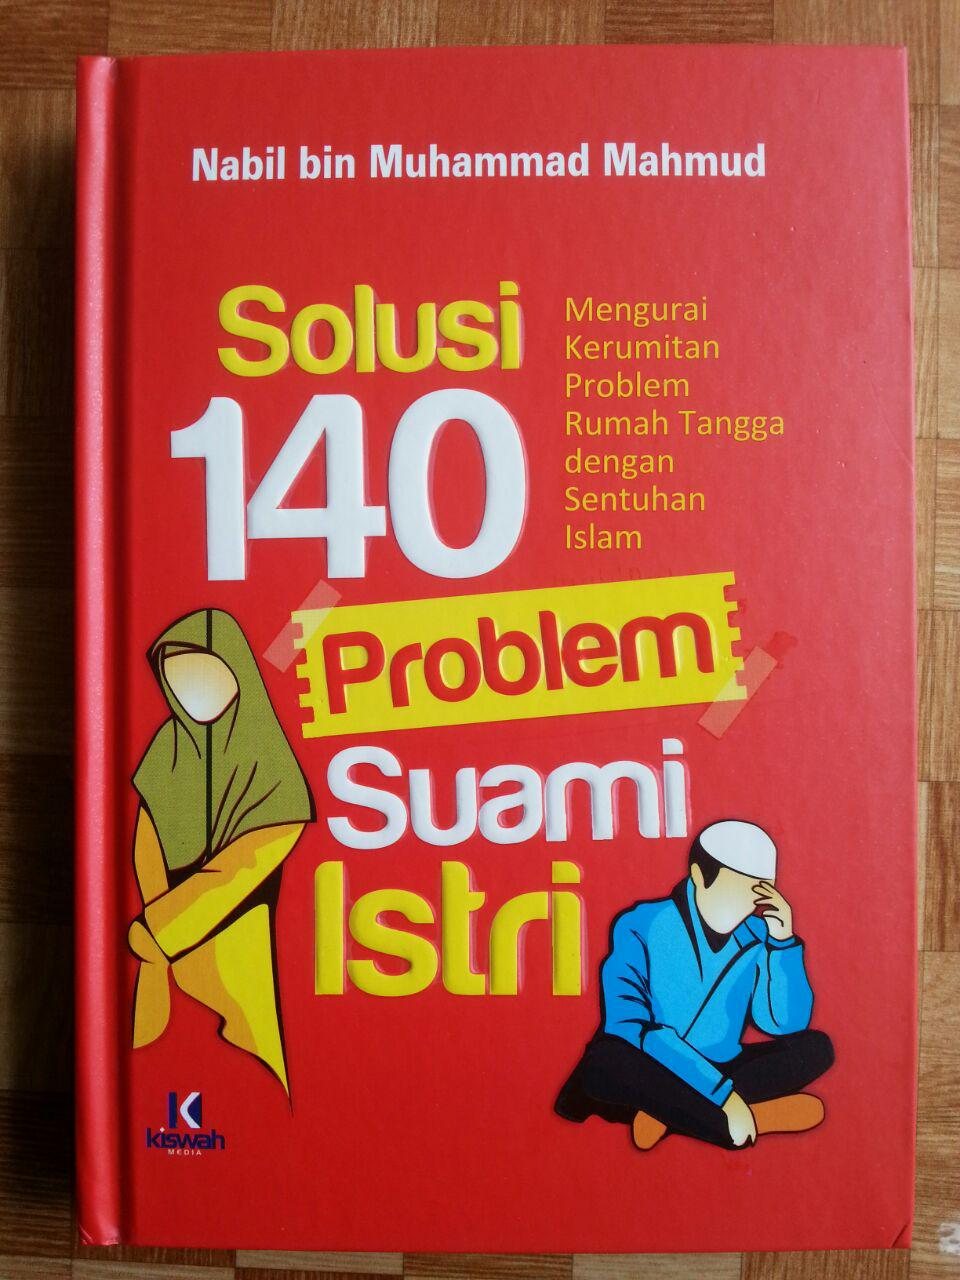 Buku Solusi 140 Problem Suami Istri cover 2